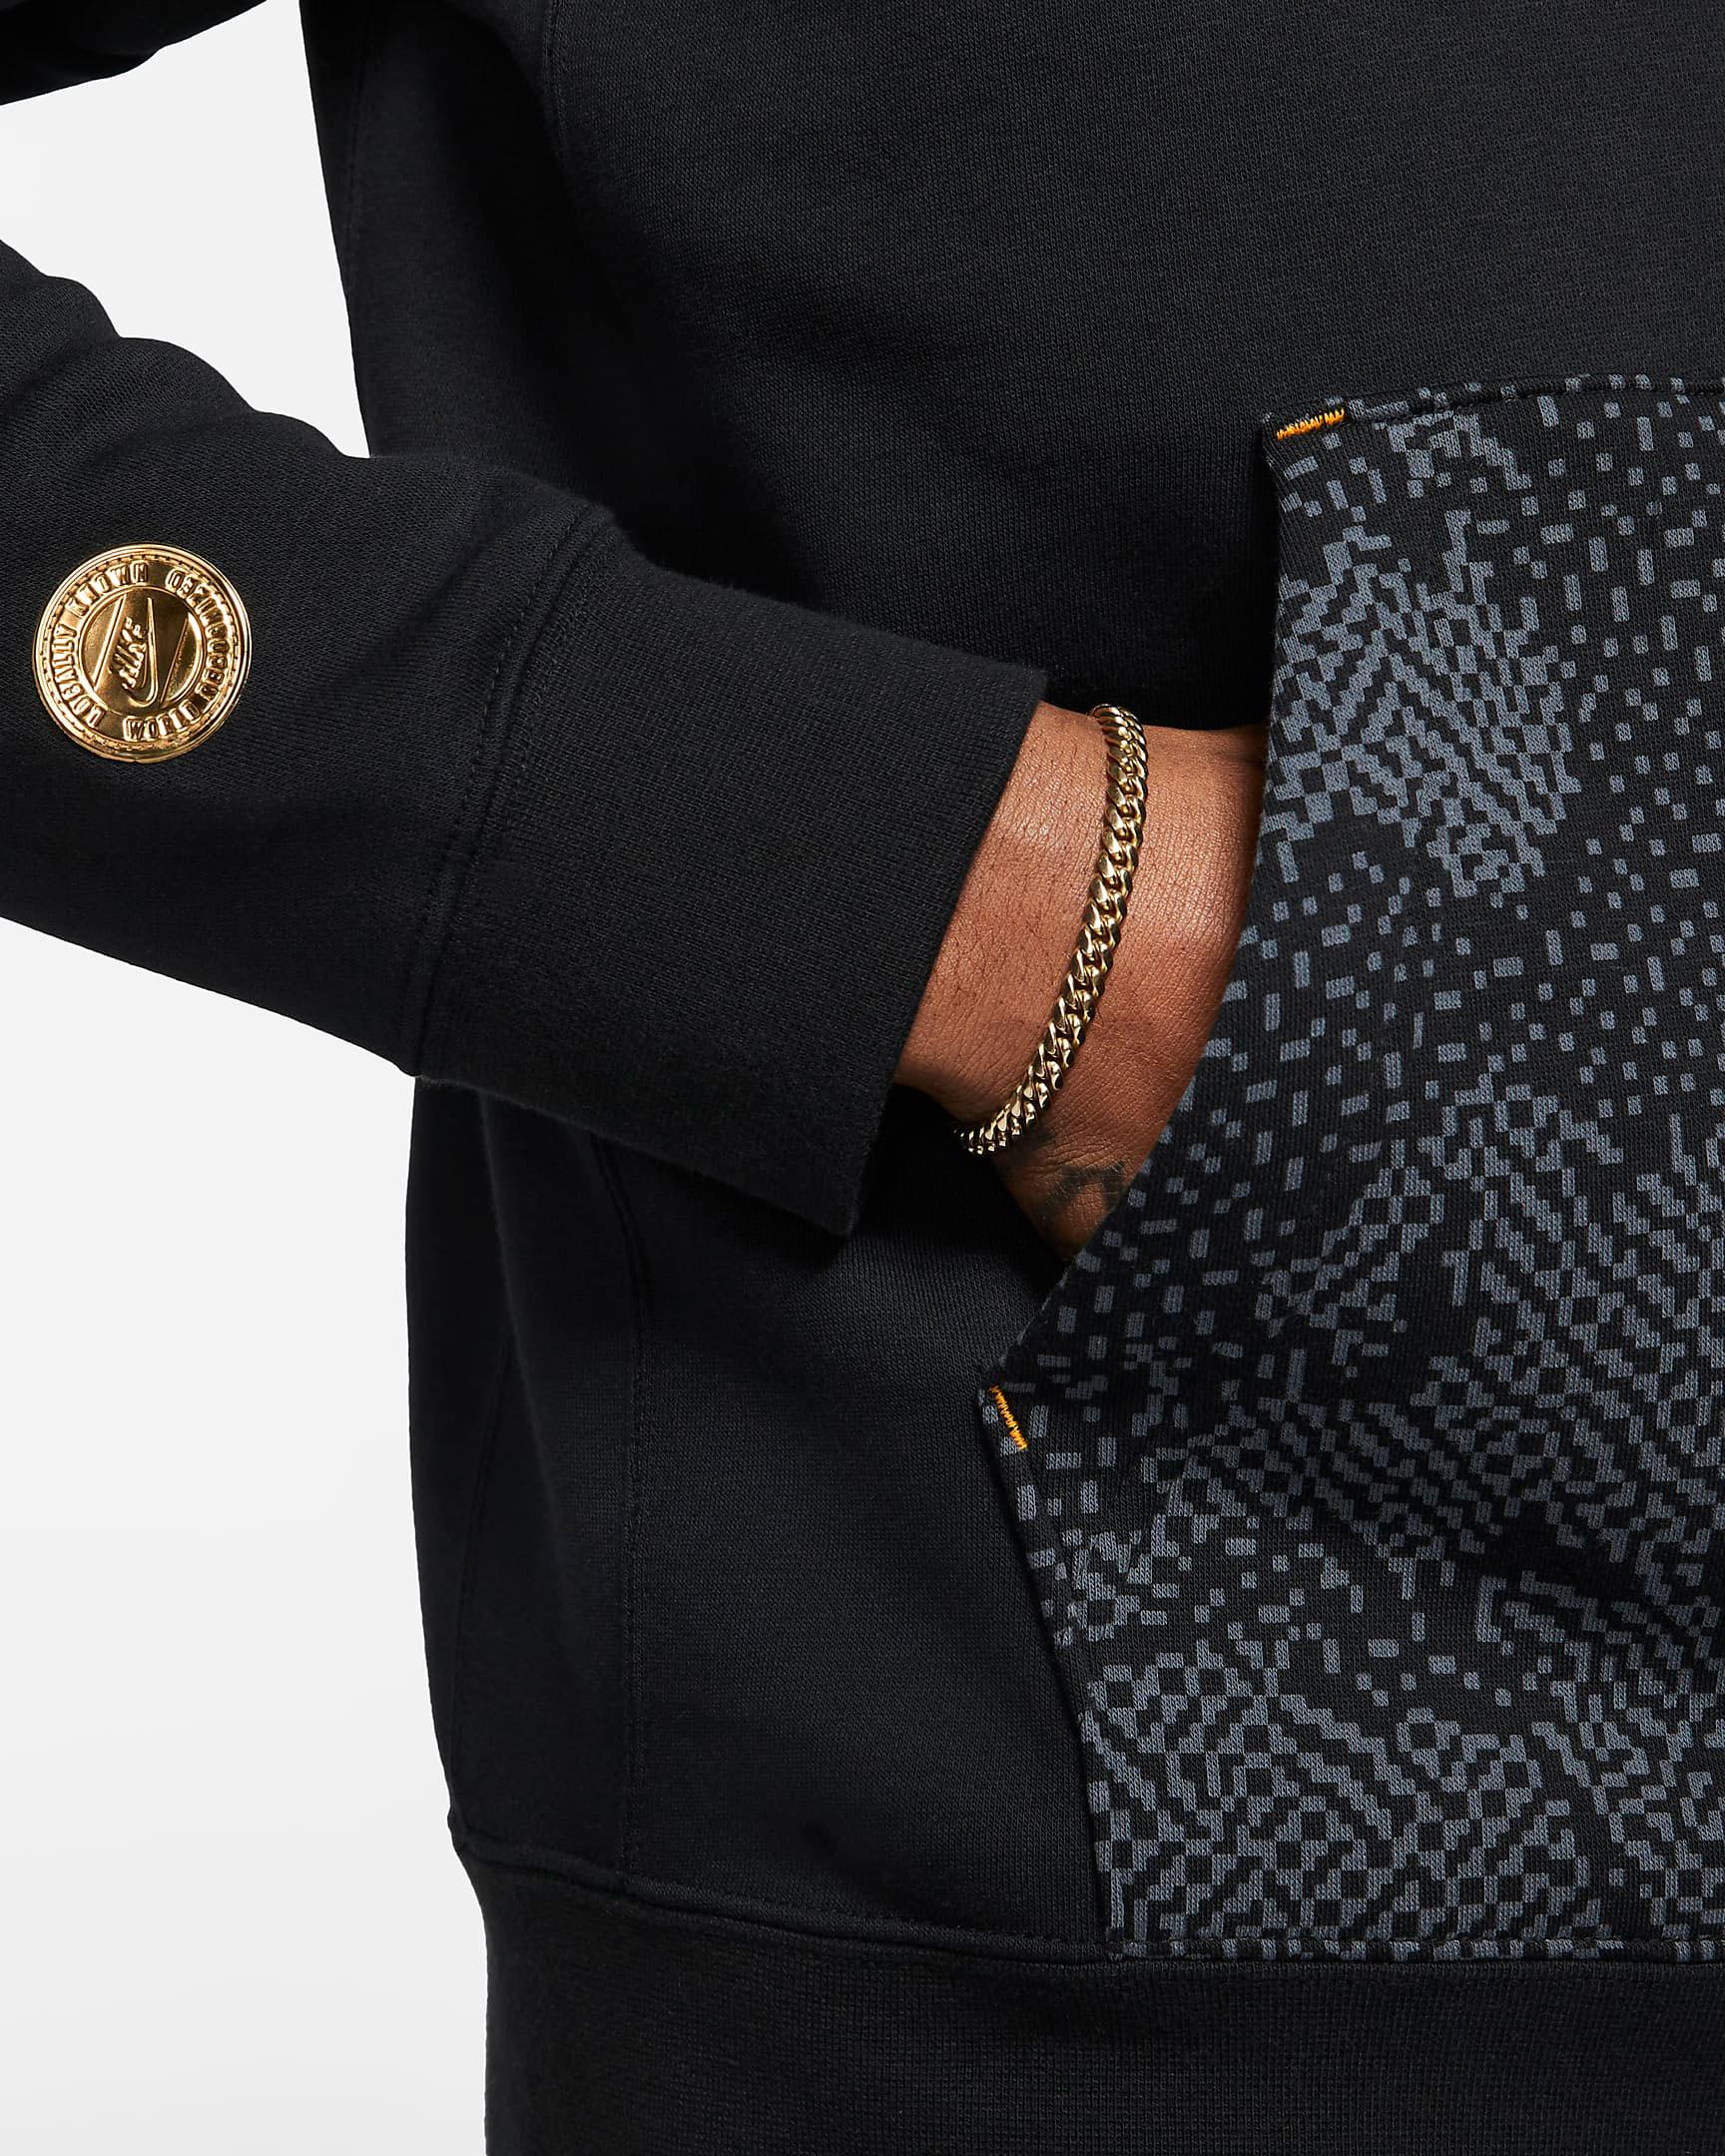 jordan-9-university-gold-nike-hoodie-3